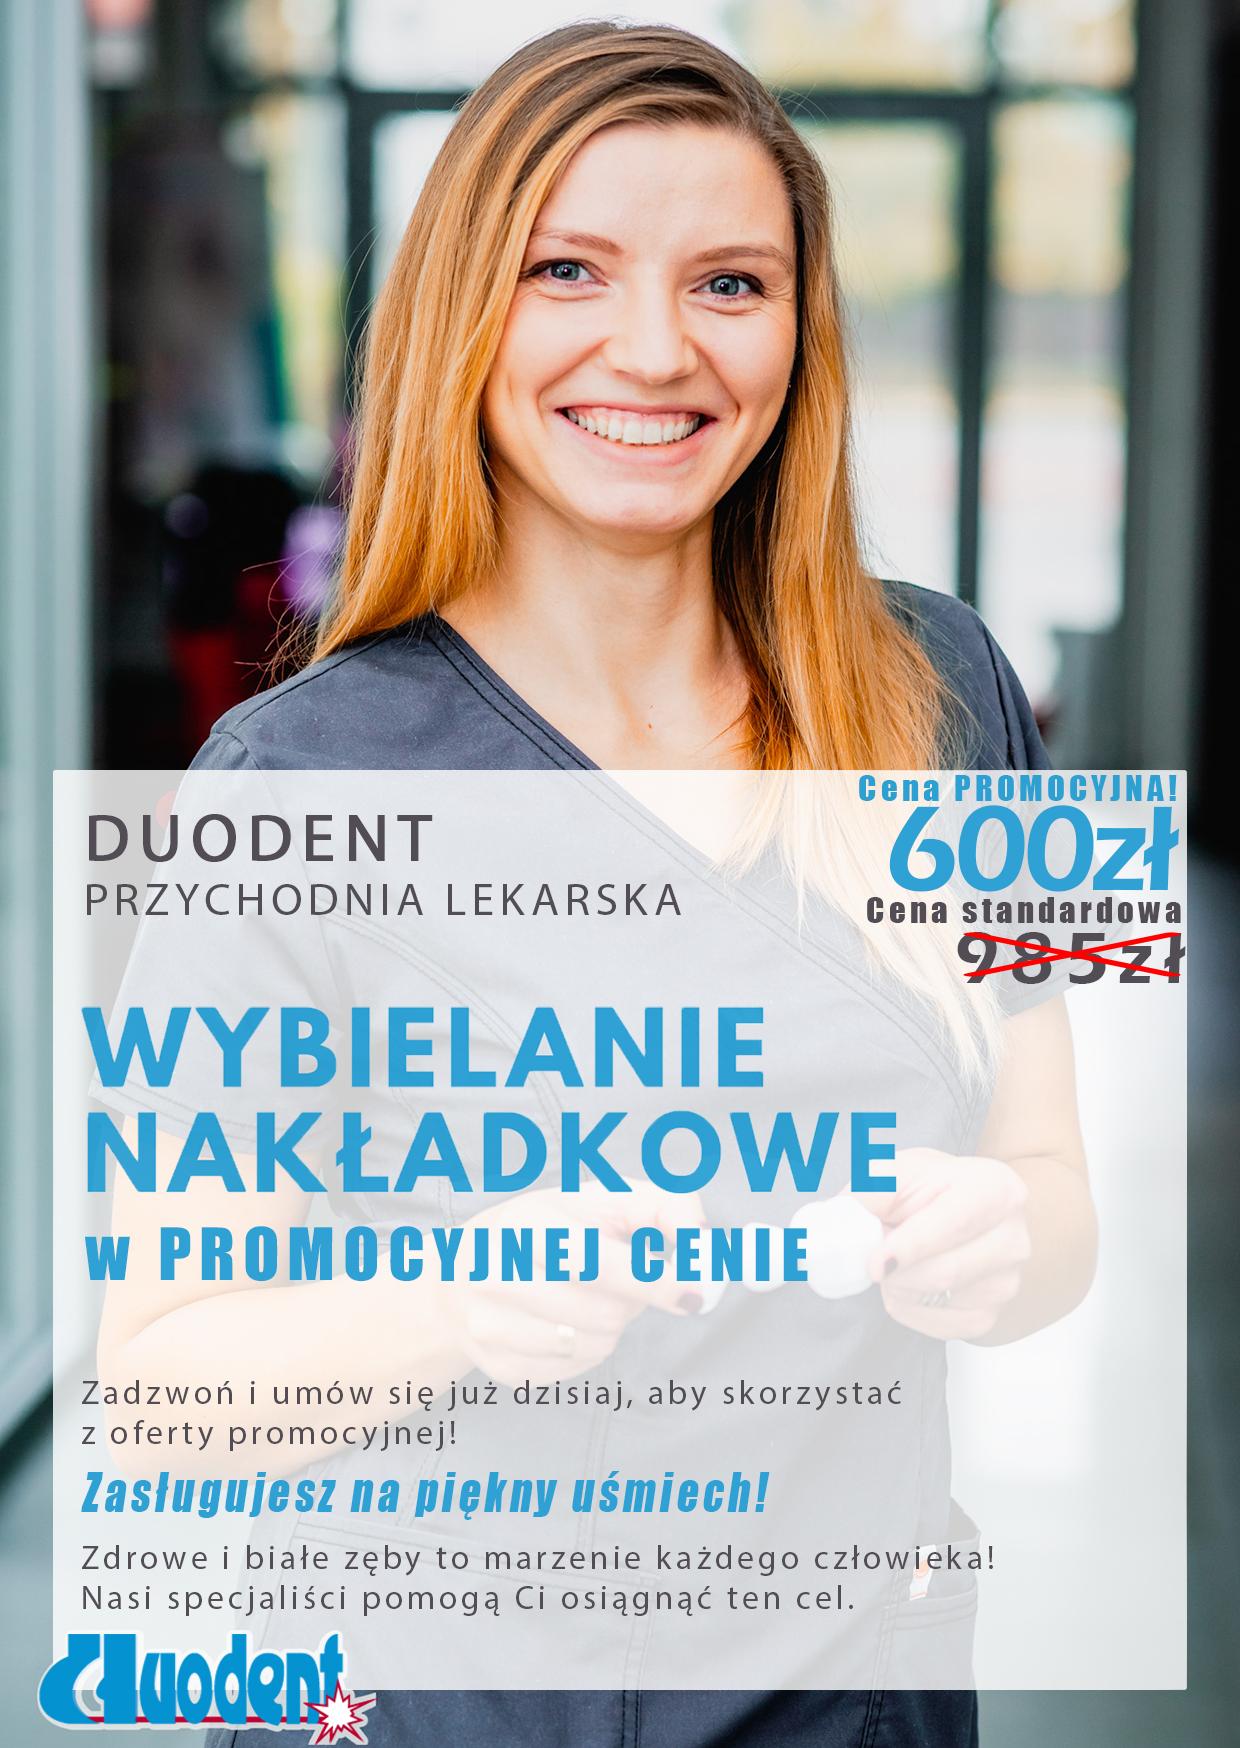 https://duodent.com.pl/wp-content/uploads/2021/05/Wybielanie-600-1.jpg